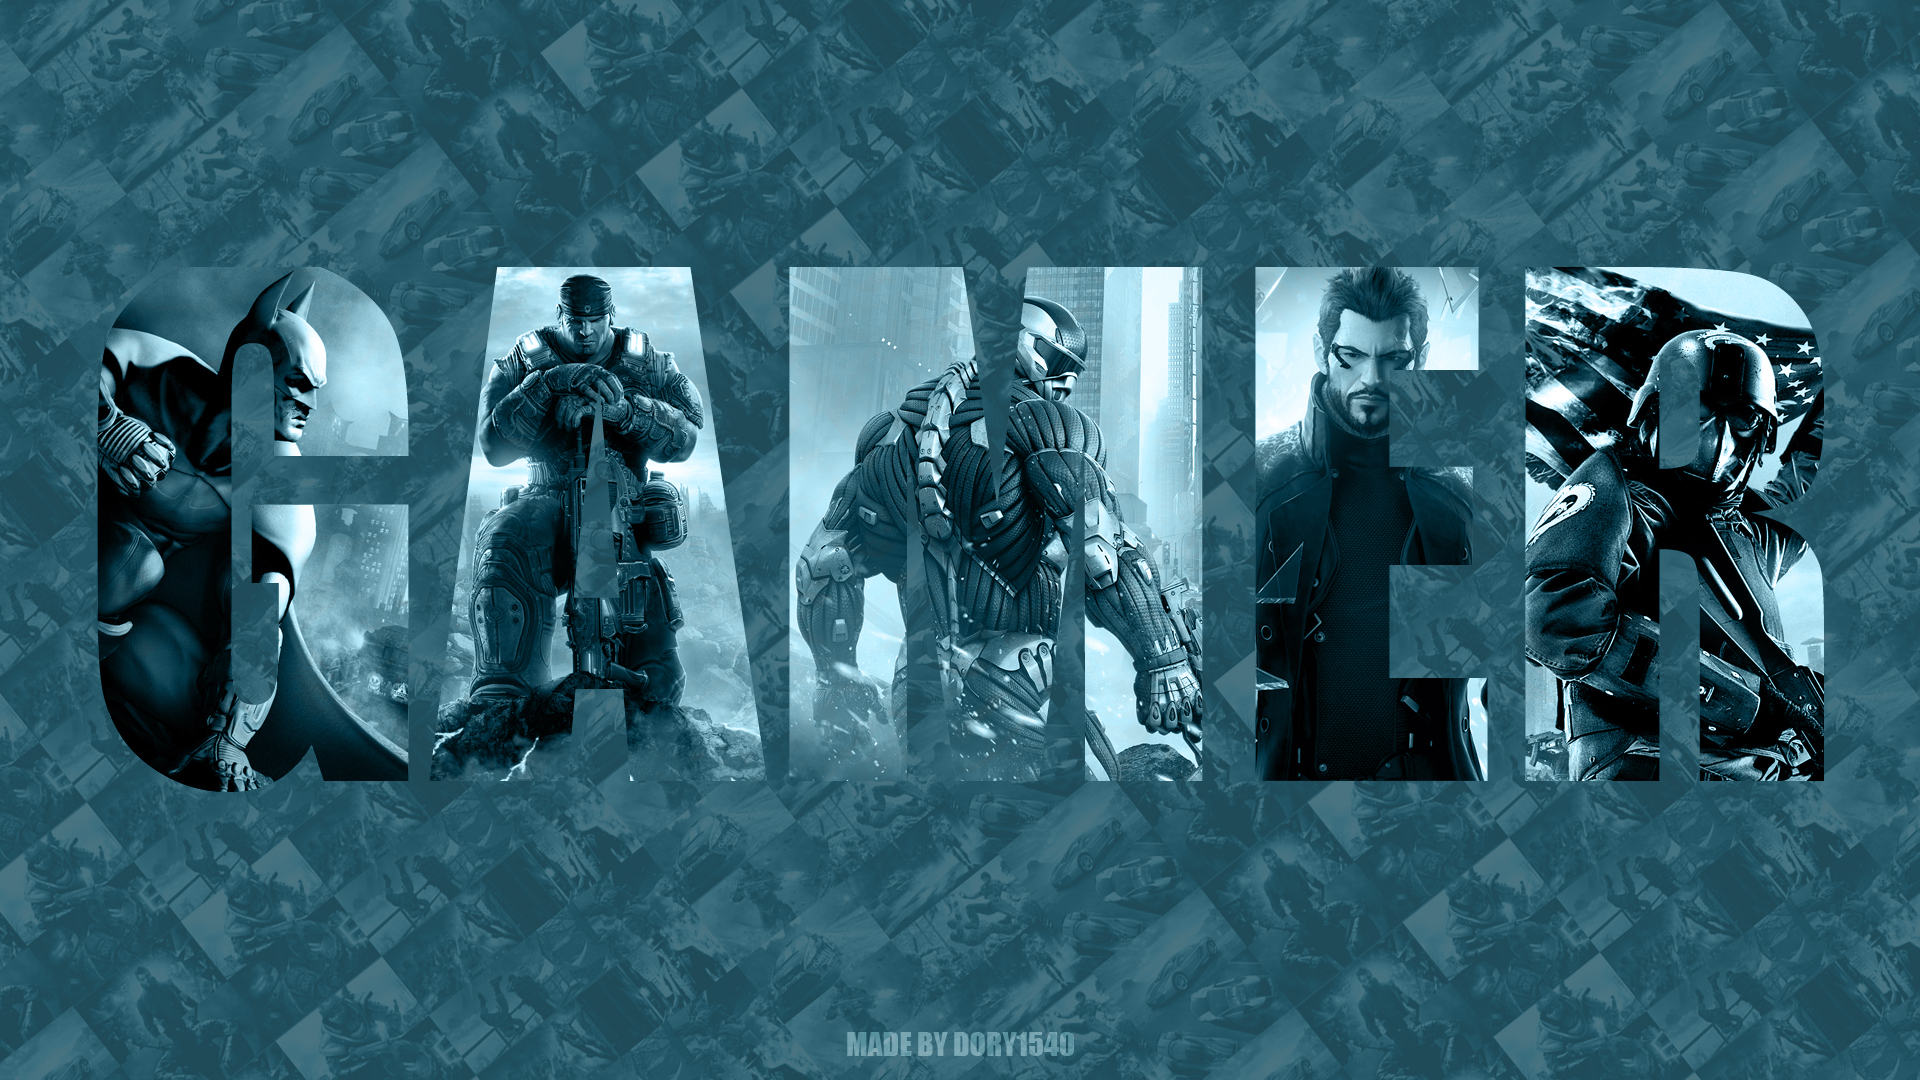 Gamer Wallpapers Hd 154898